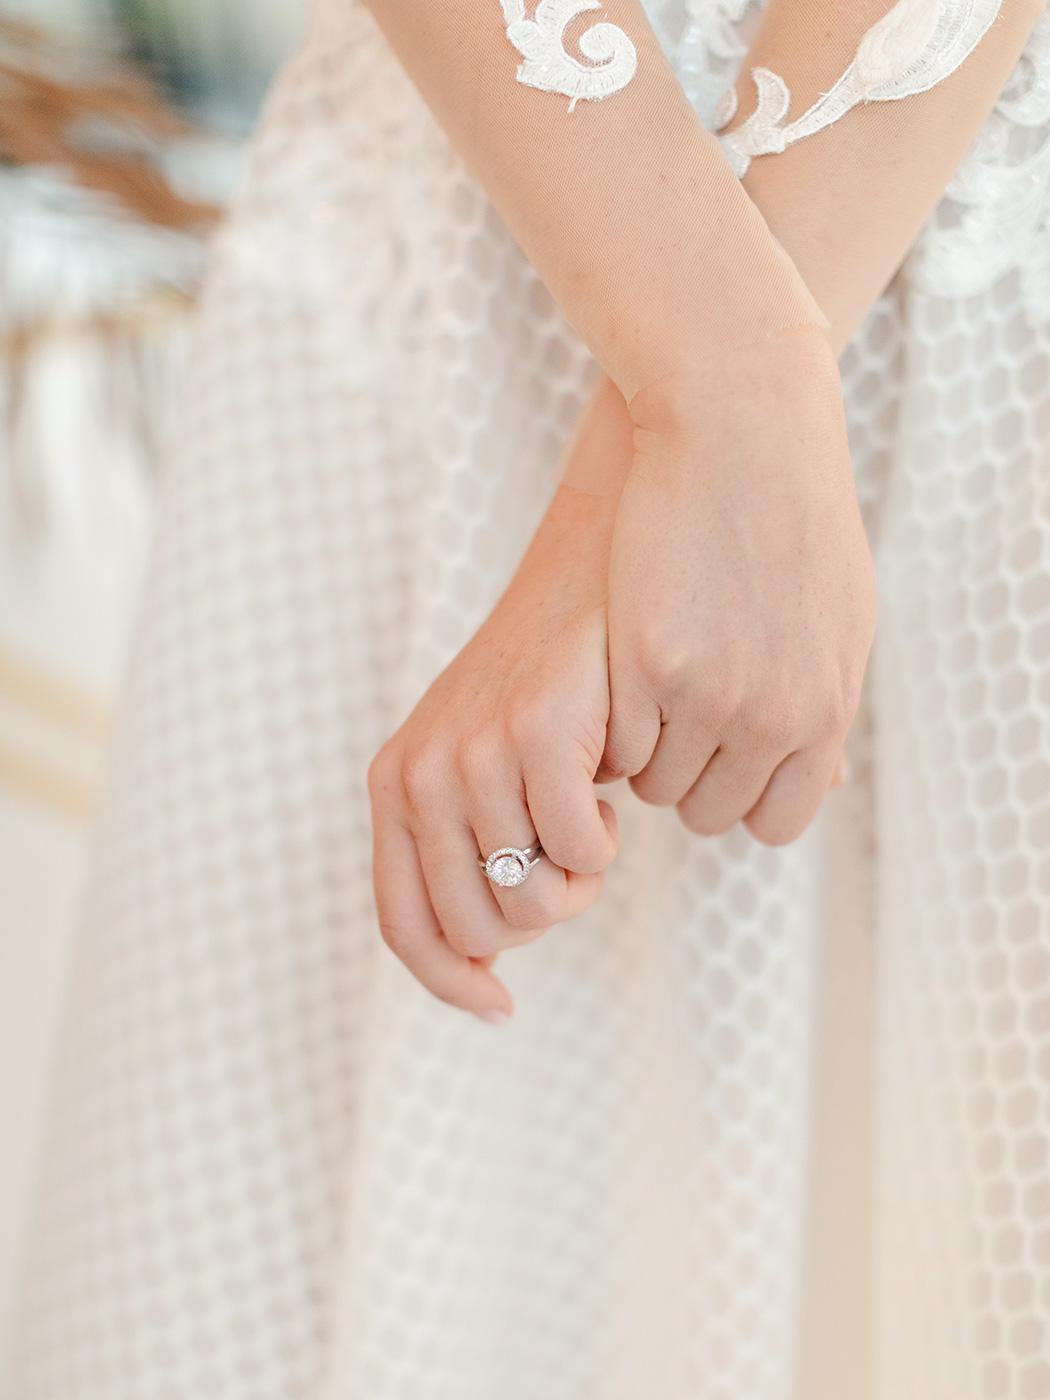 Ring by Taneka Storm Jewellery | Rensche Mari